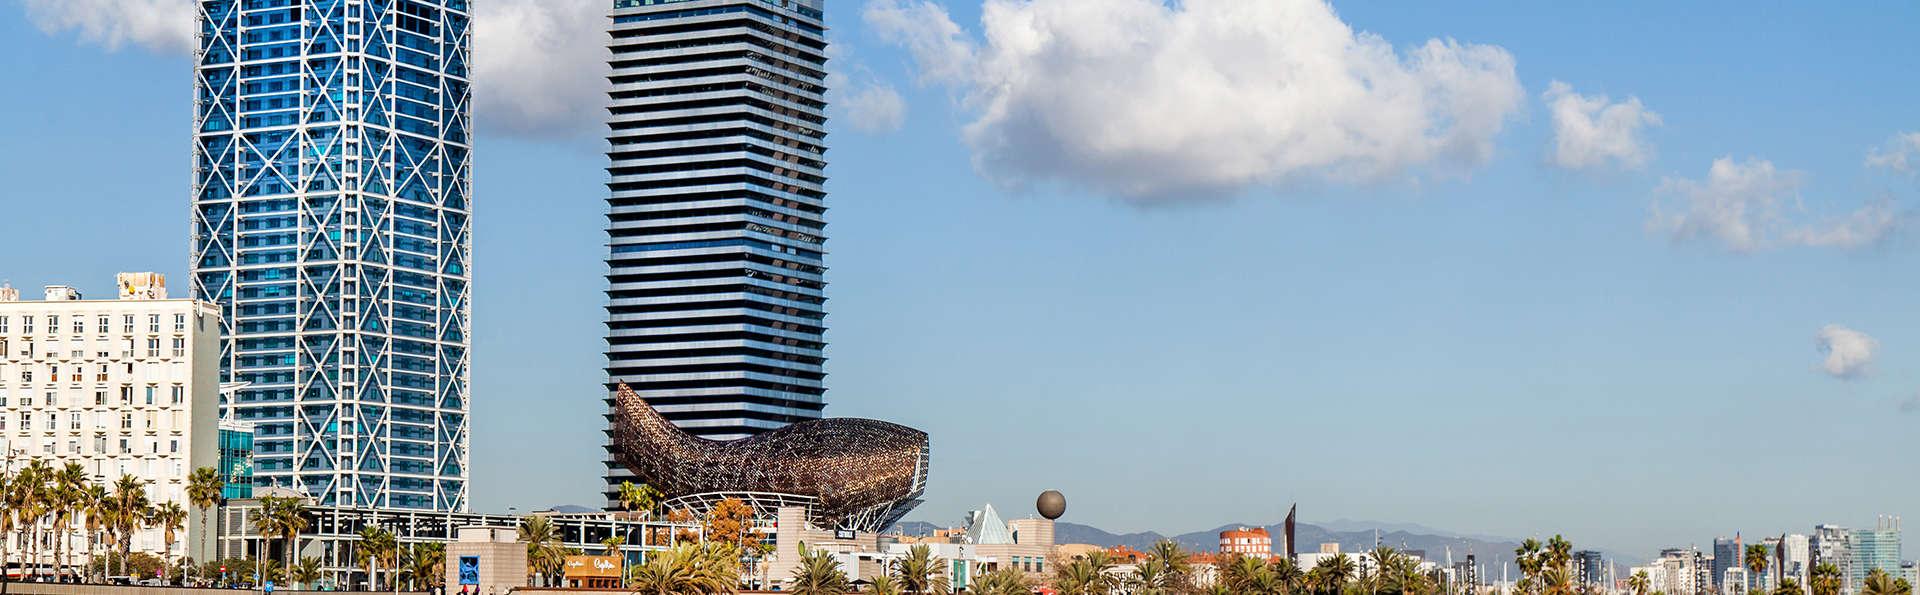 URH Ciutat de Mataró - EDIT_destination.jpg